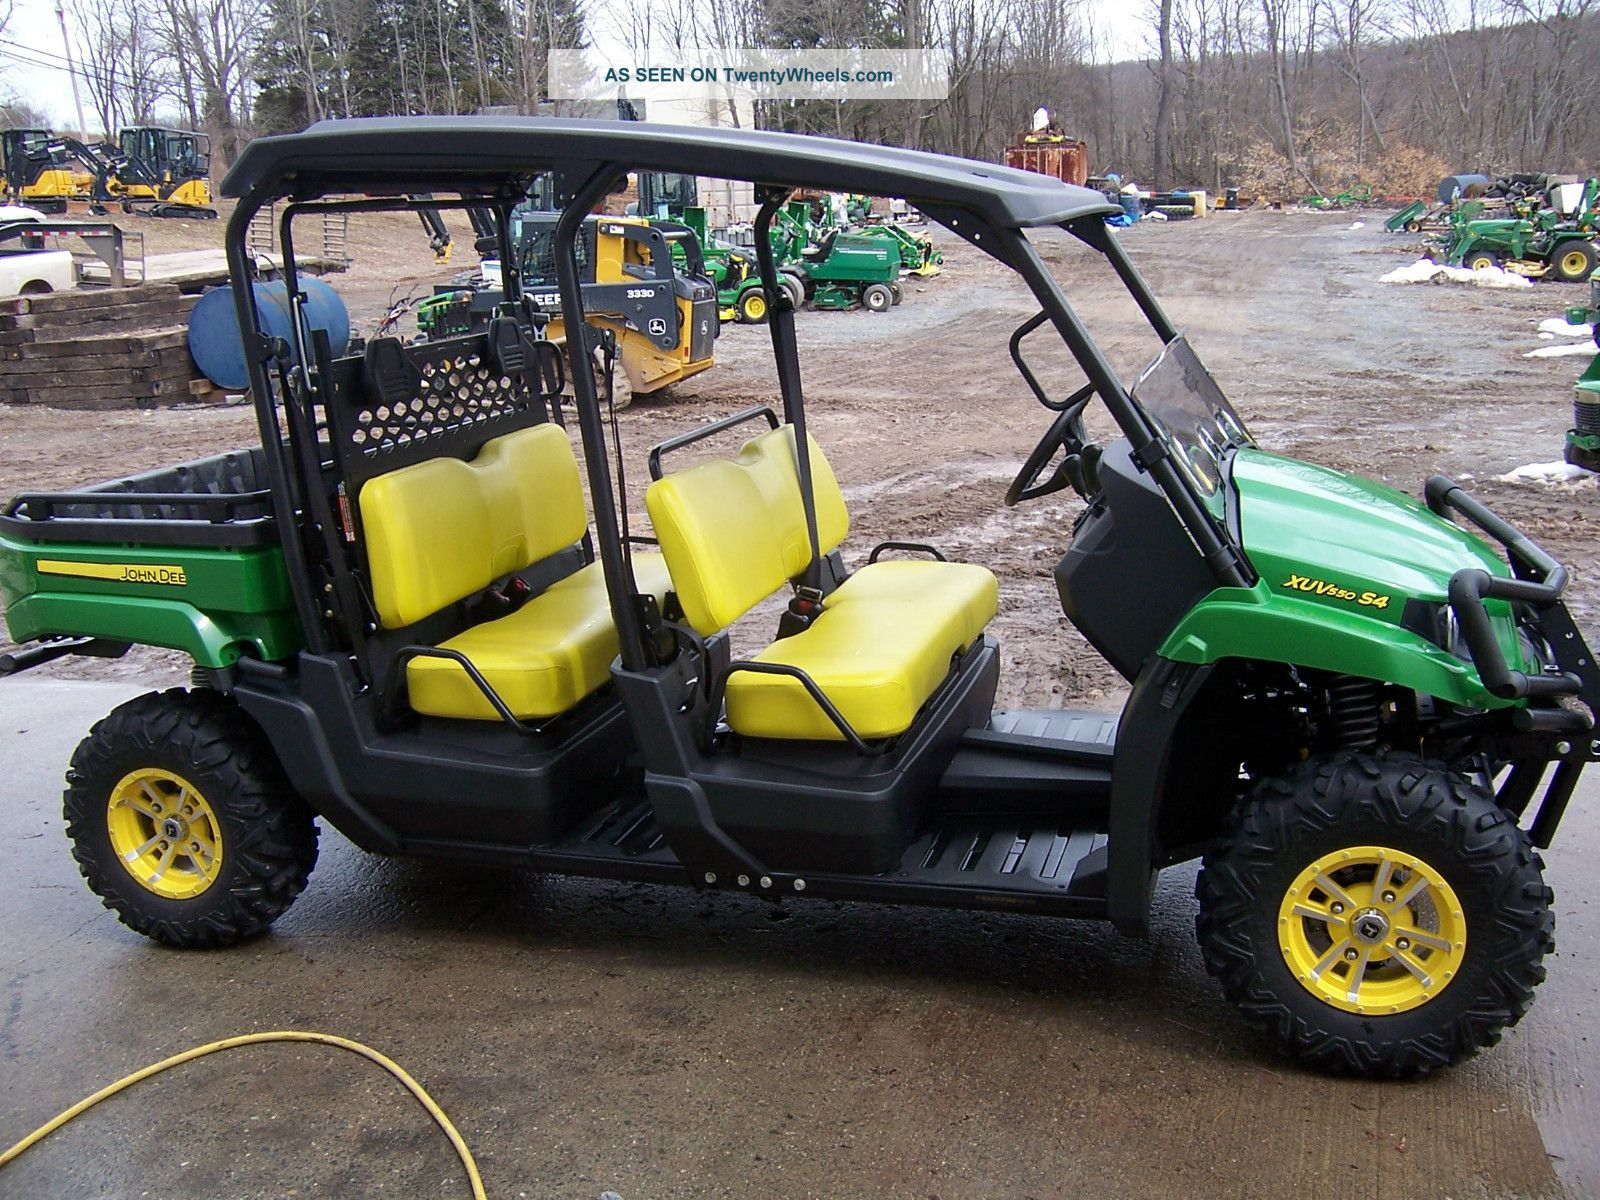 John Deere Xuv 550 S4 Utility Vehicles photo